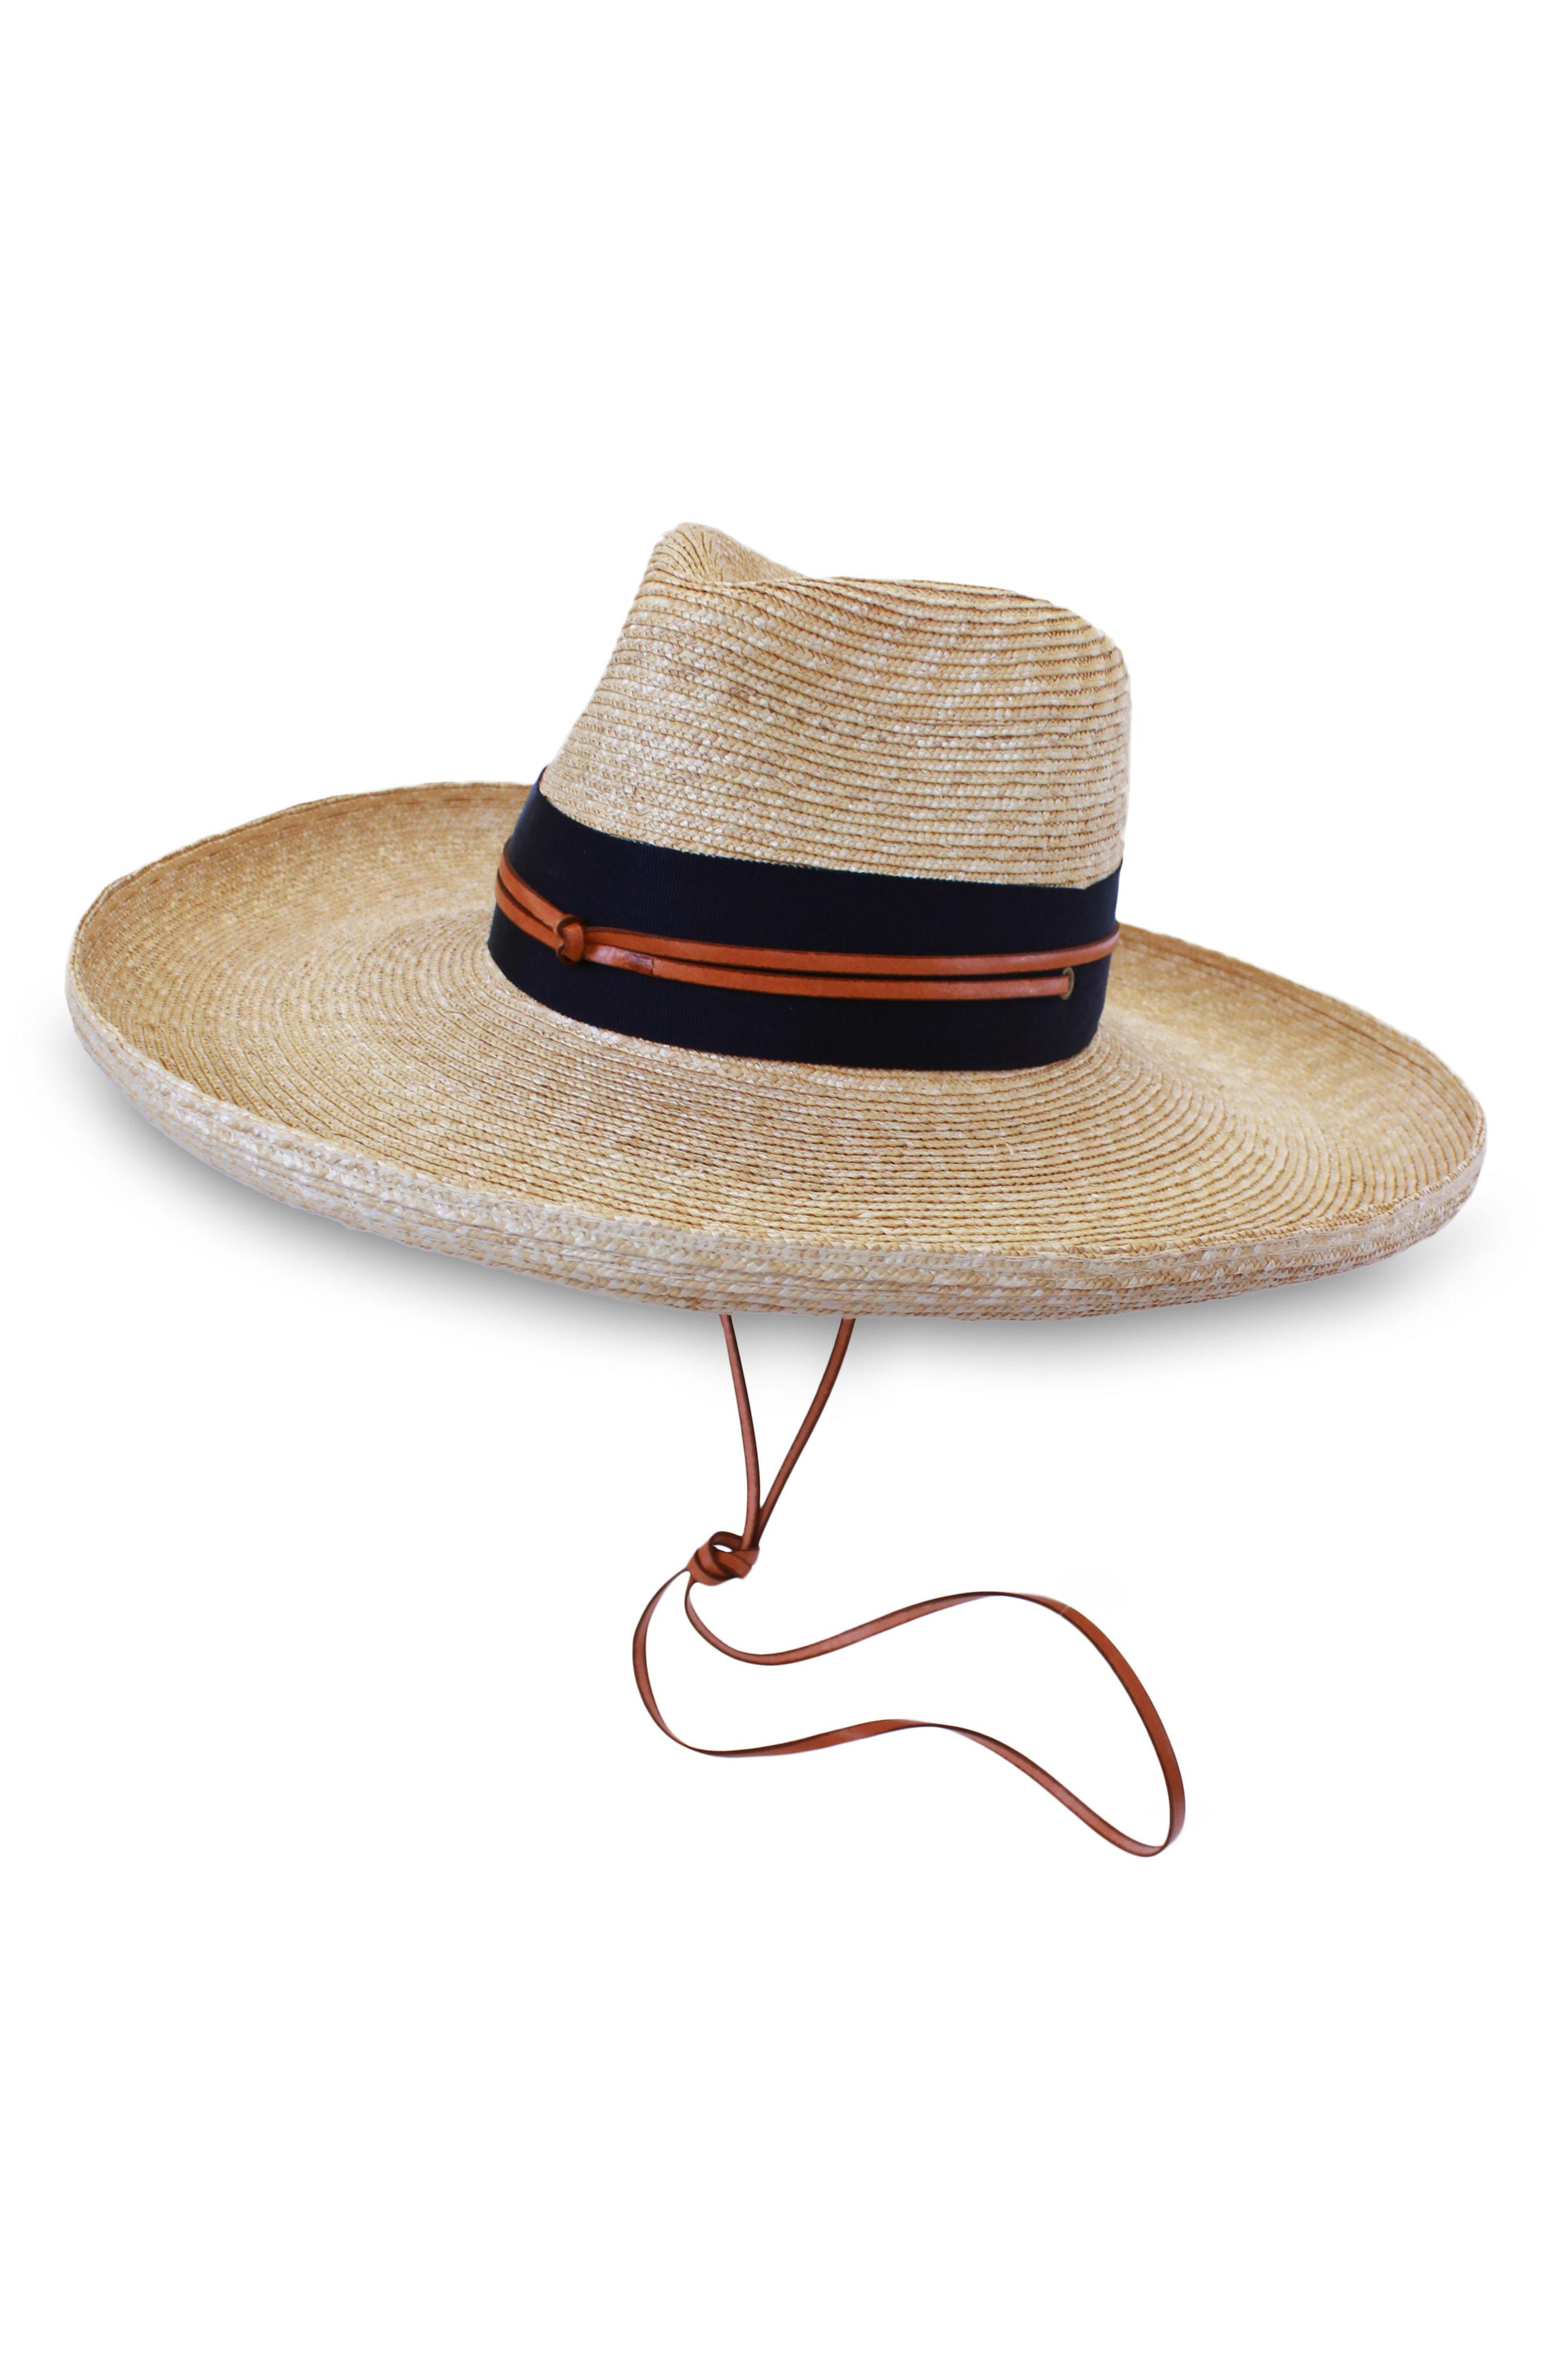 Lola Hats. Women s Comargo Raffia Hat be7f24e6c0ed